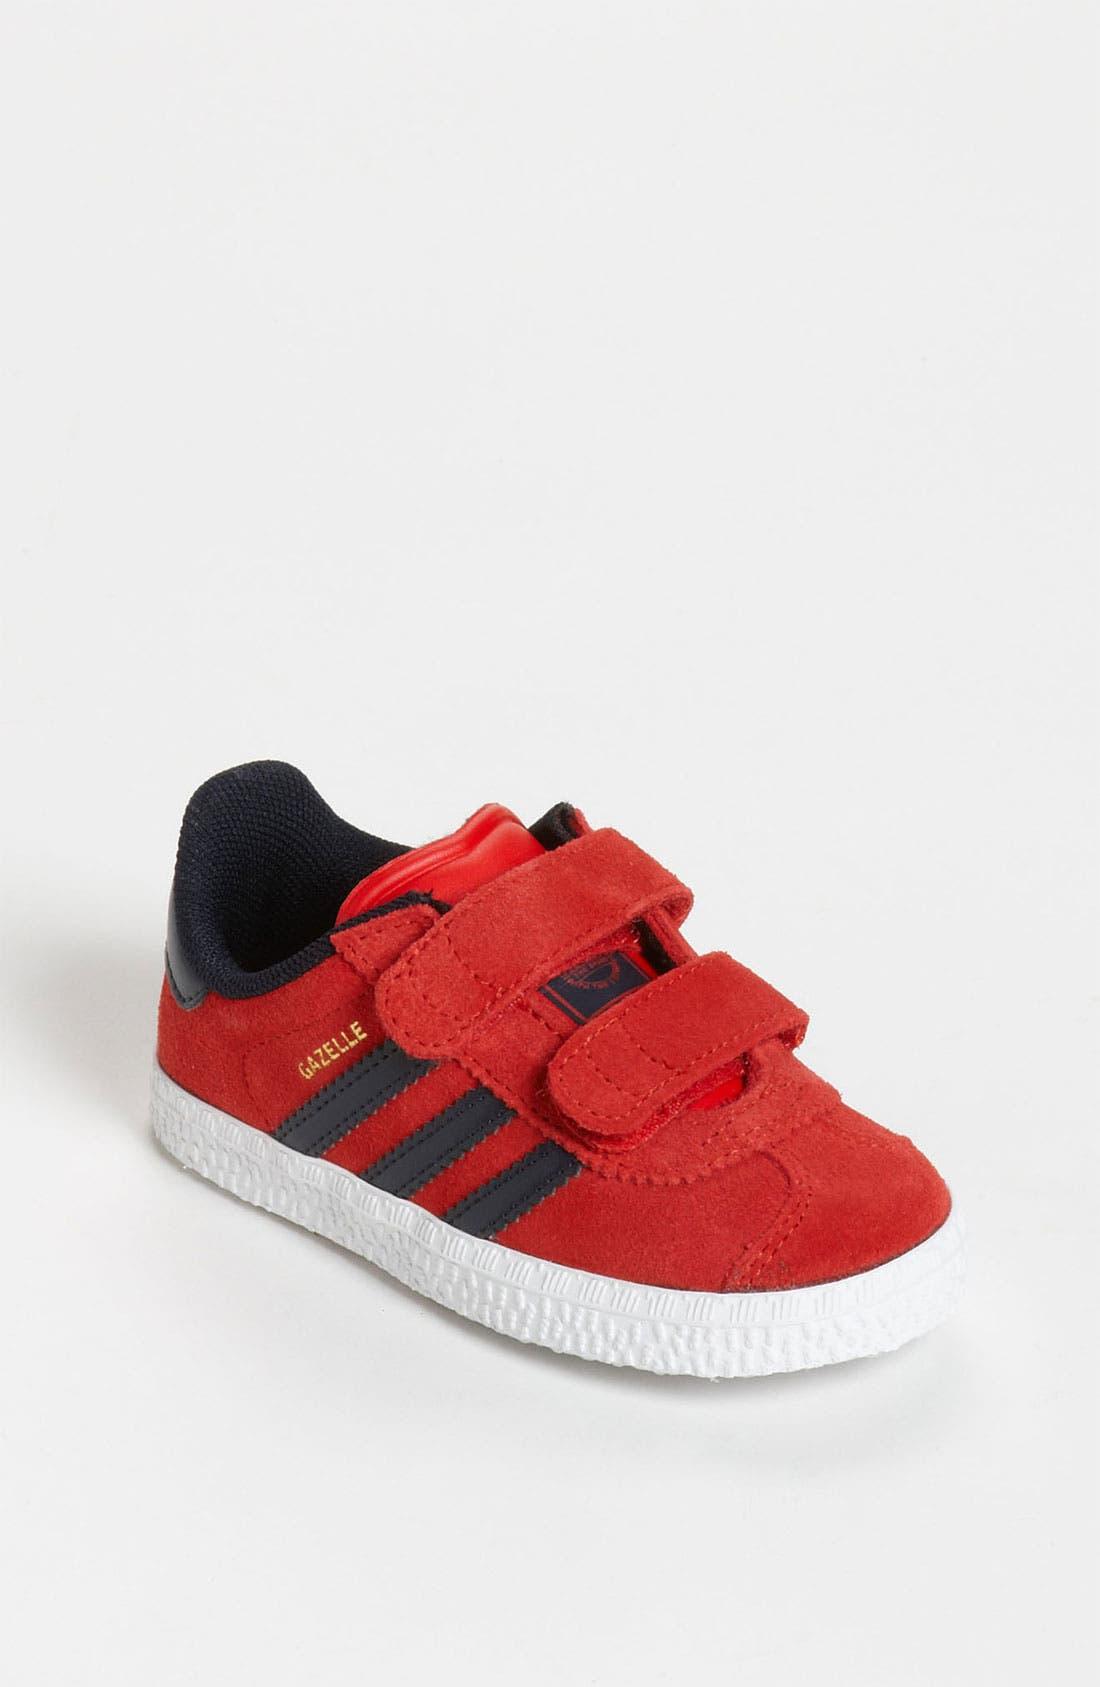 Alternate Image 1 Selected - adidas 'Gazelle' Sneaker (Baby, Walker & Toddler)